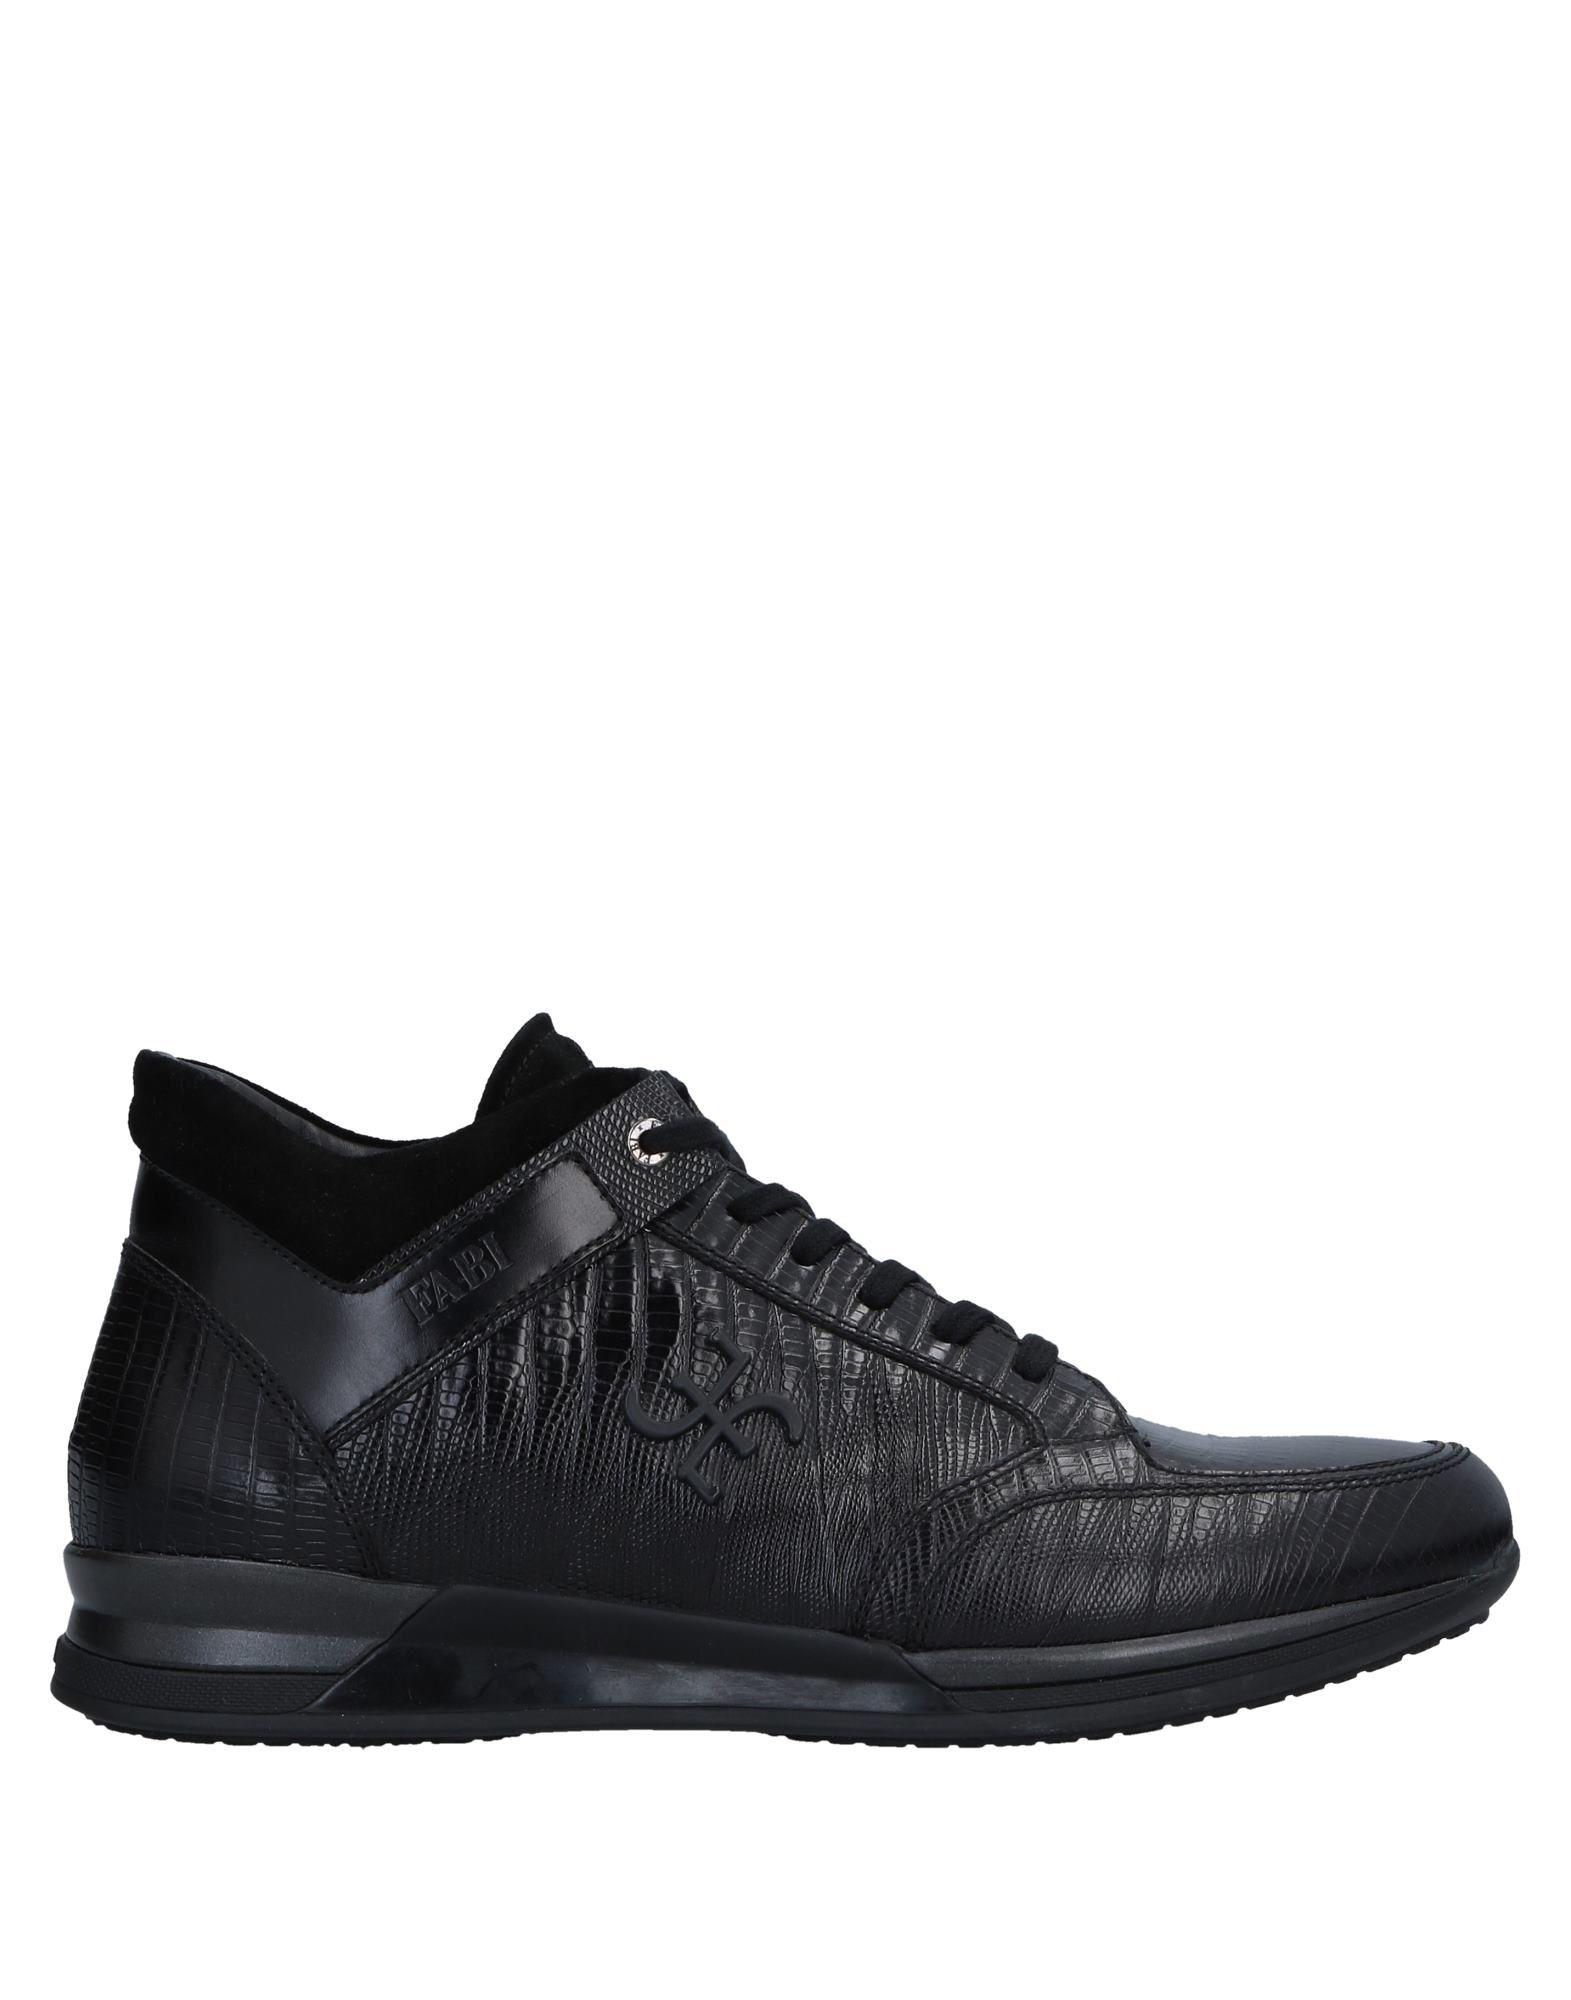 Sneakers Fabi Homme - Sneakers Fabi  Noir Meilleur modèle de vente